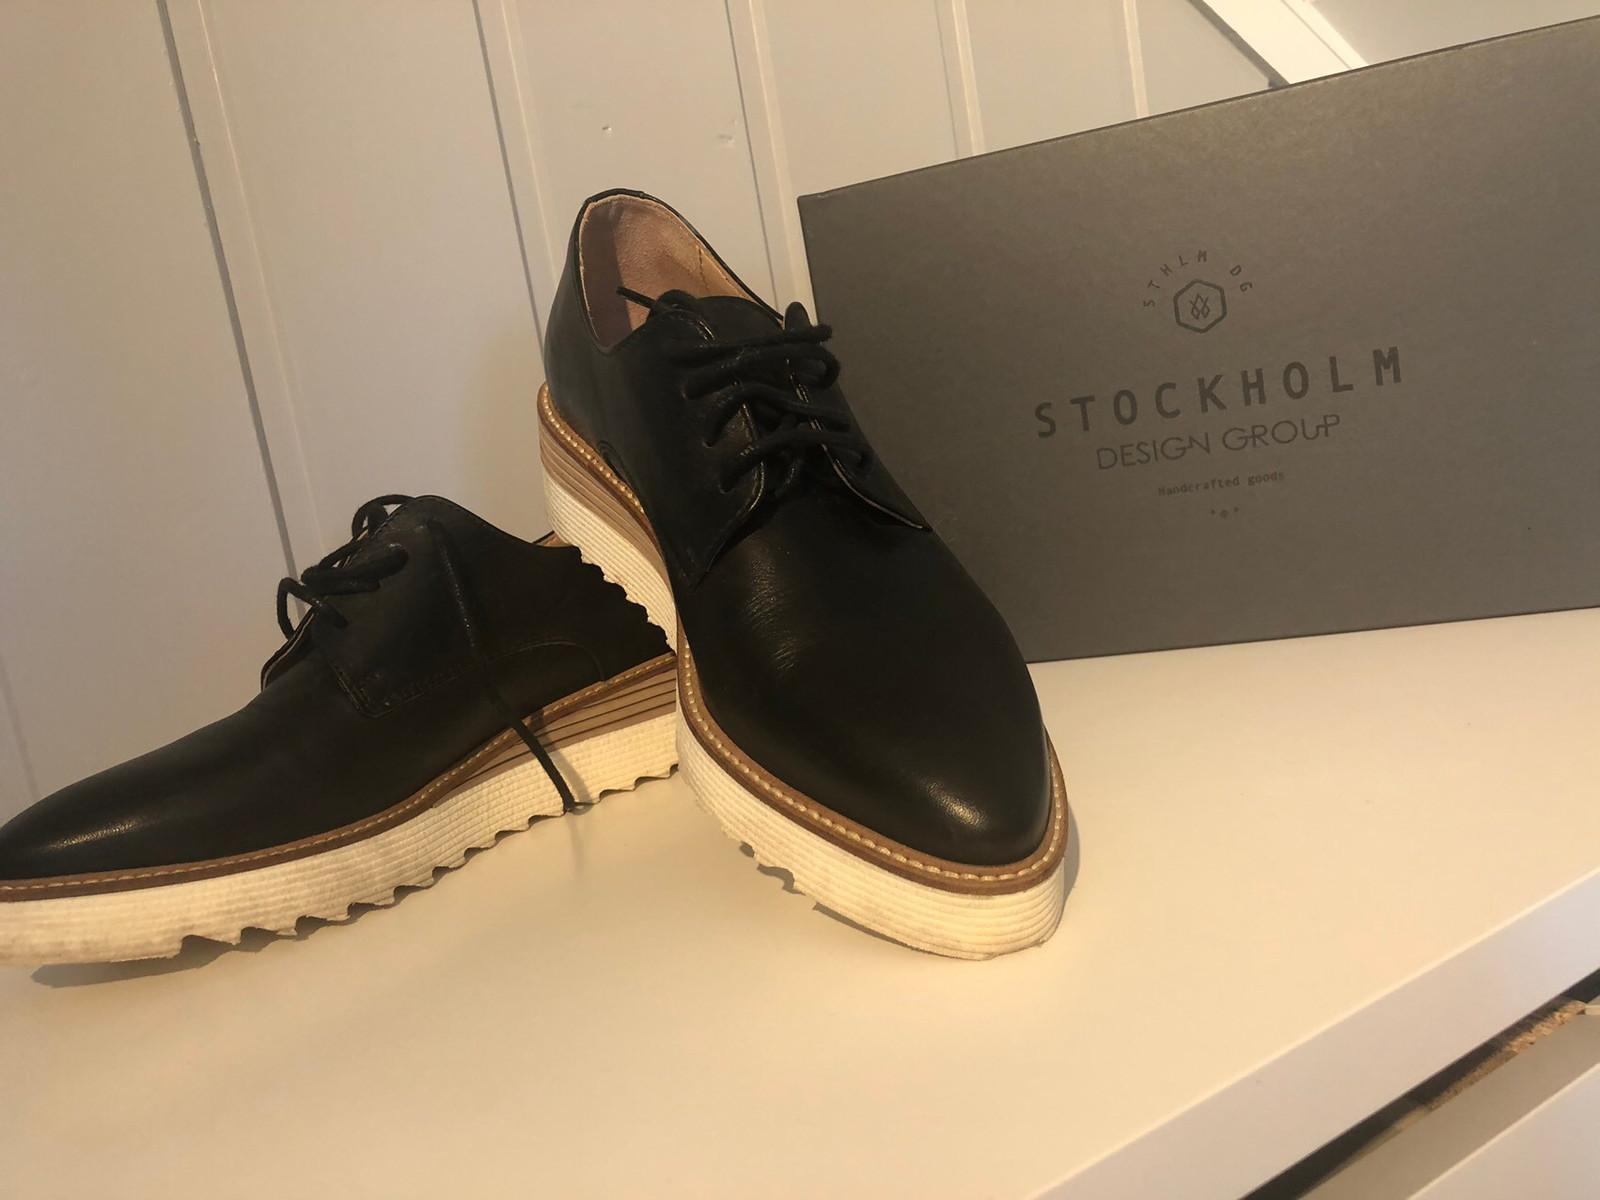 Stockholm designgroup sko 38 | FINN.no